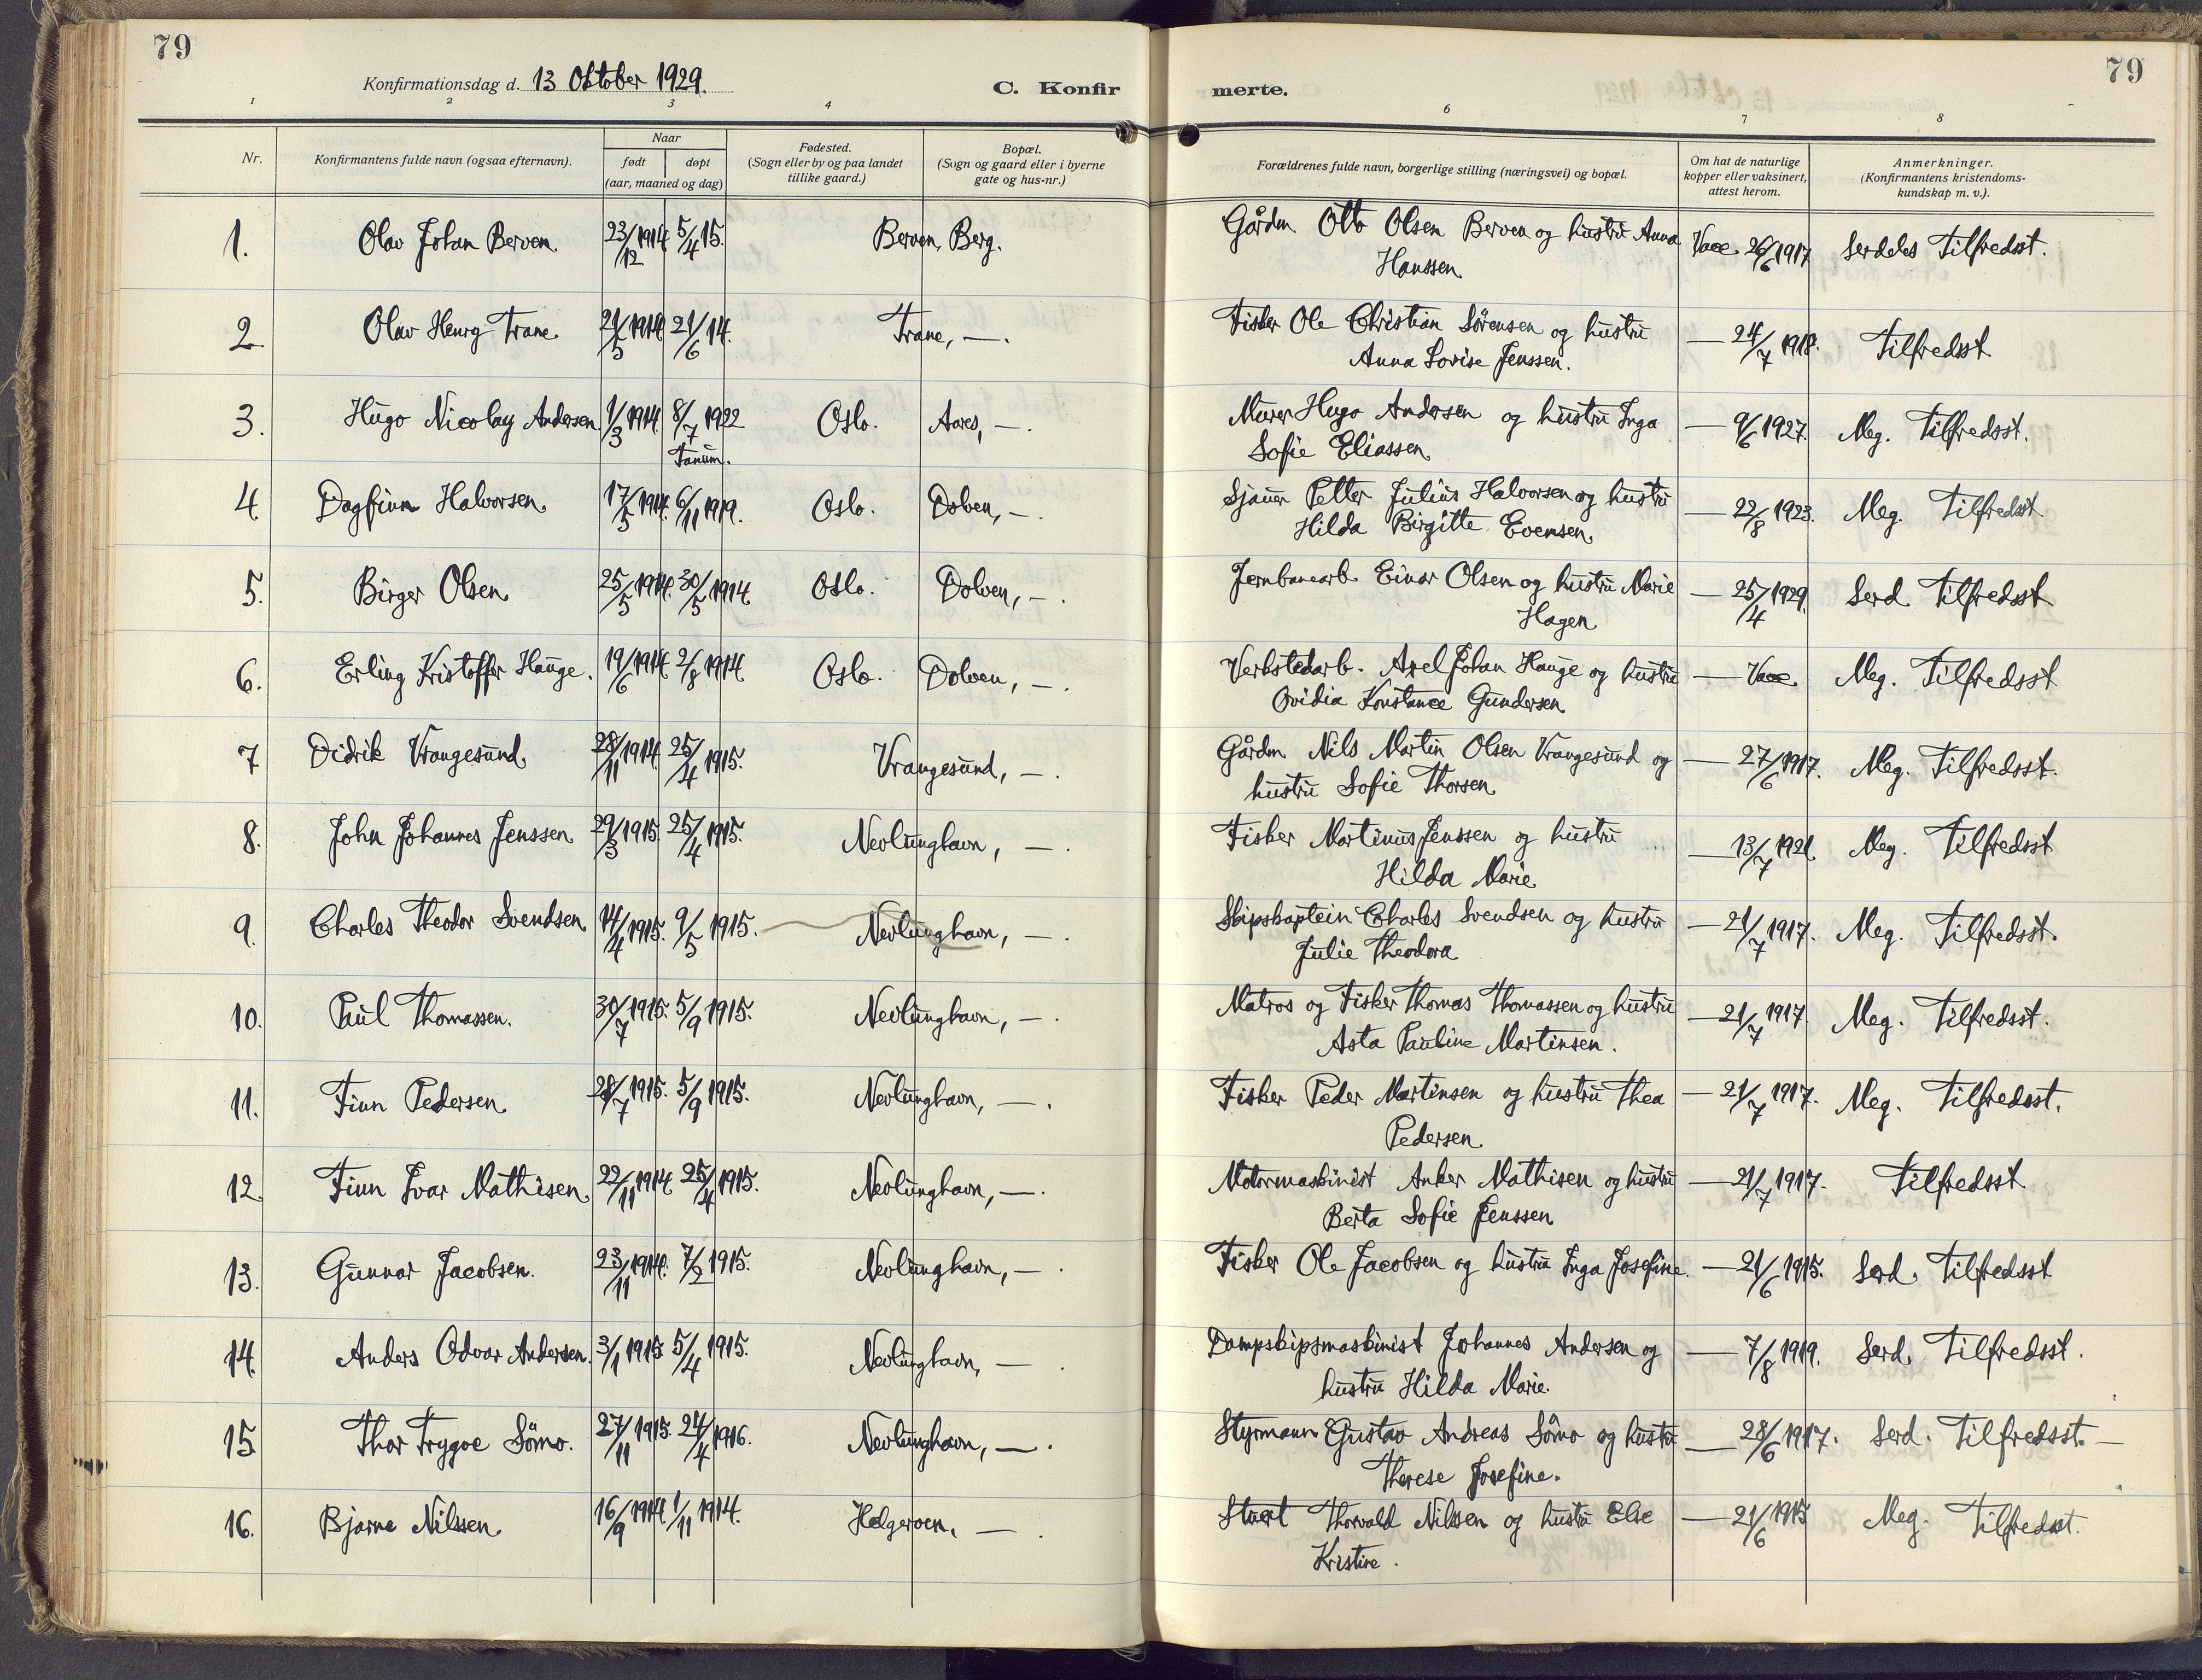 SAKO, Brunlanes kirkebøker, F/Fb/L0004: Ministerialbok nr. II 4, 1923-1940, s. 79